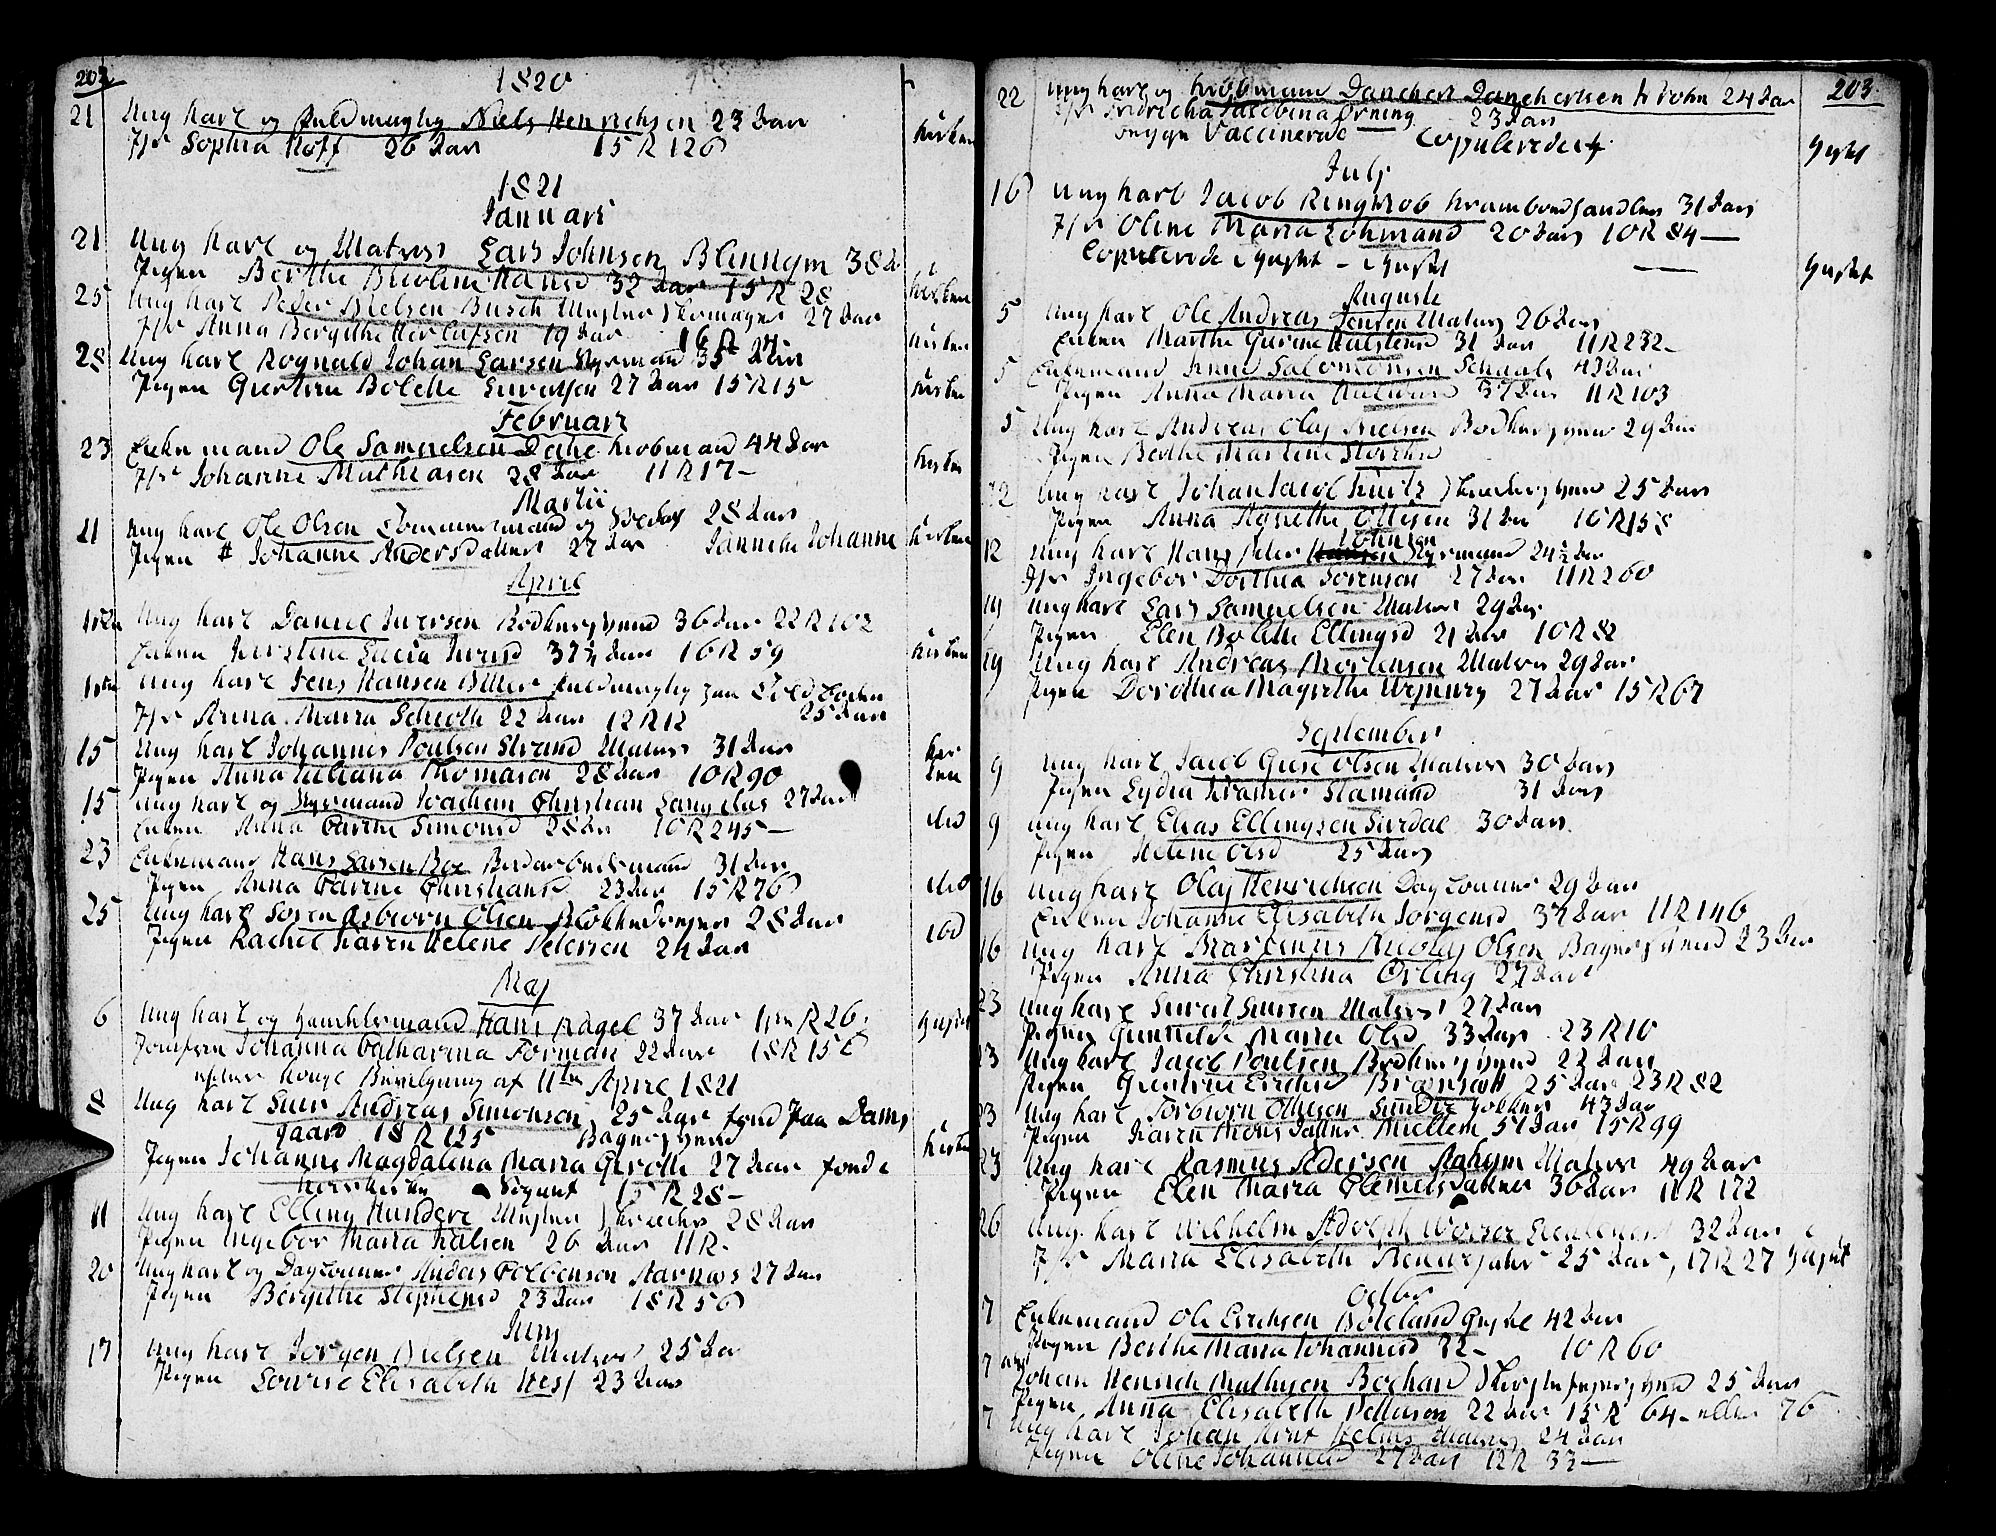 SAB, Domkirken Sokneprestembete, H/Haa/L0007: Ministerialbok nr. A 7, 1725-1826, s. 202-203